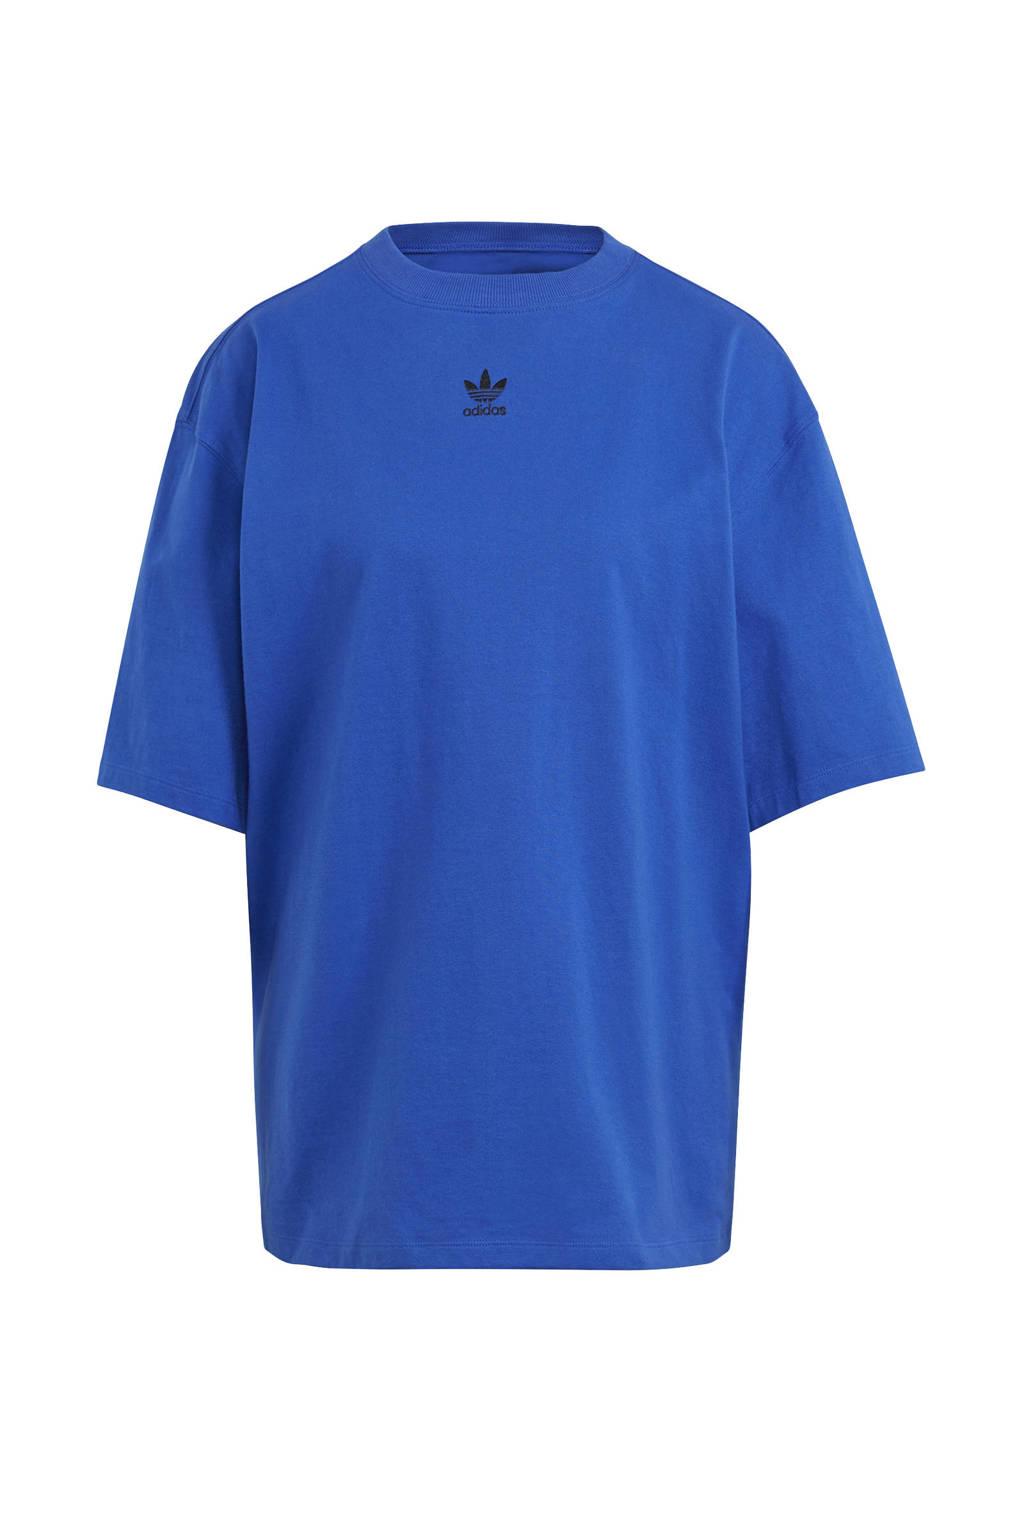 adidas Originals Adicolor T-shirt kobaltblauw, Kobaltblauw